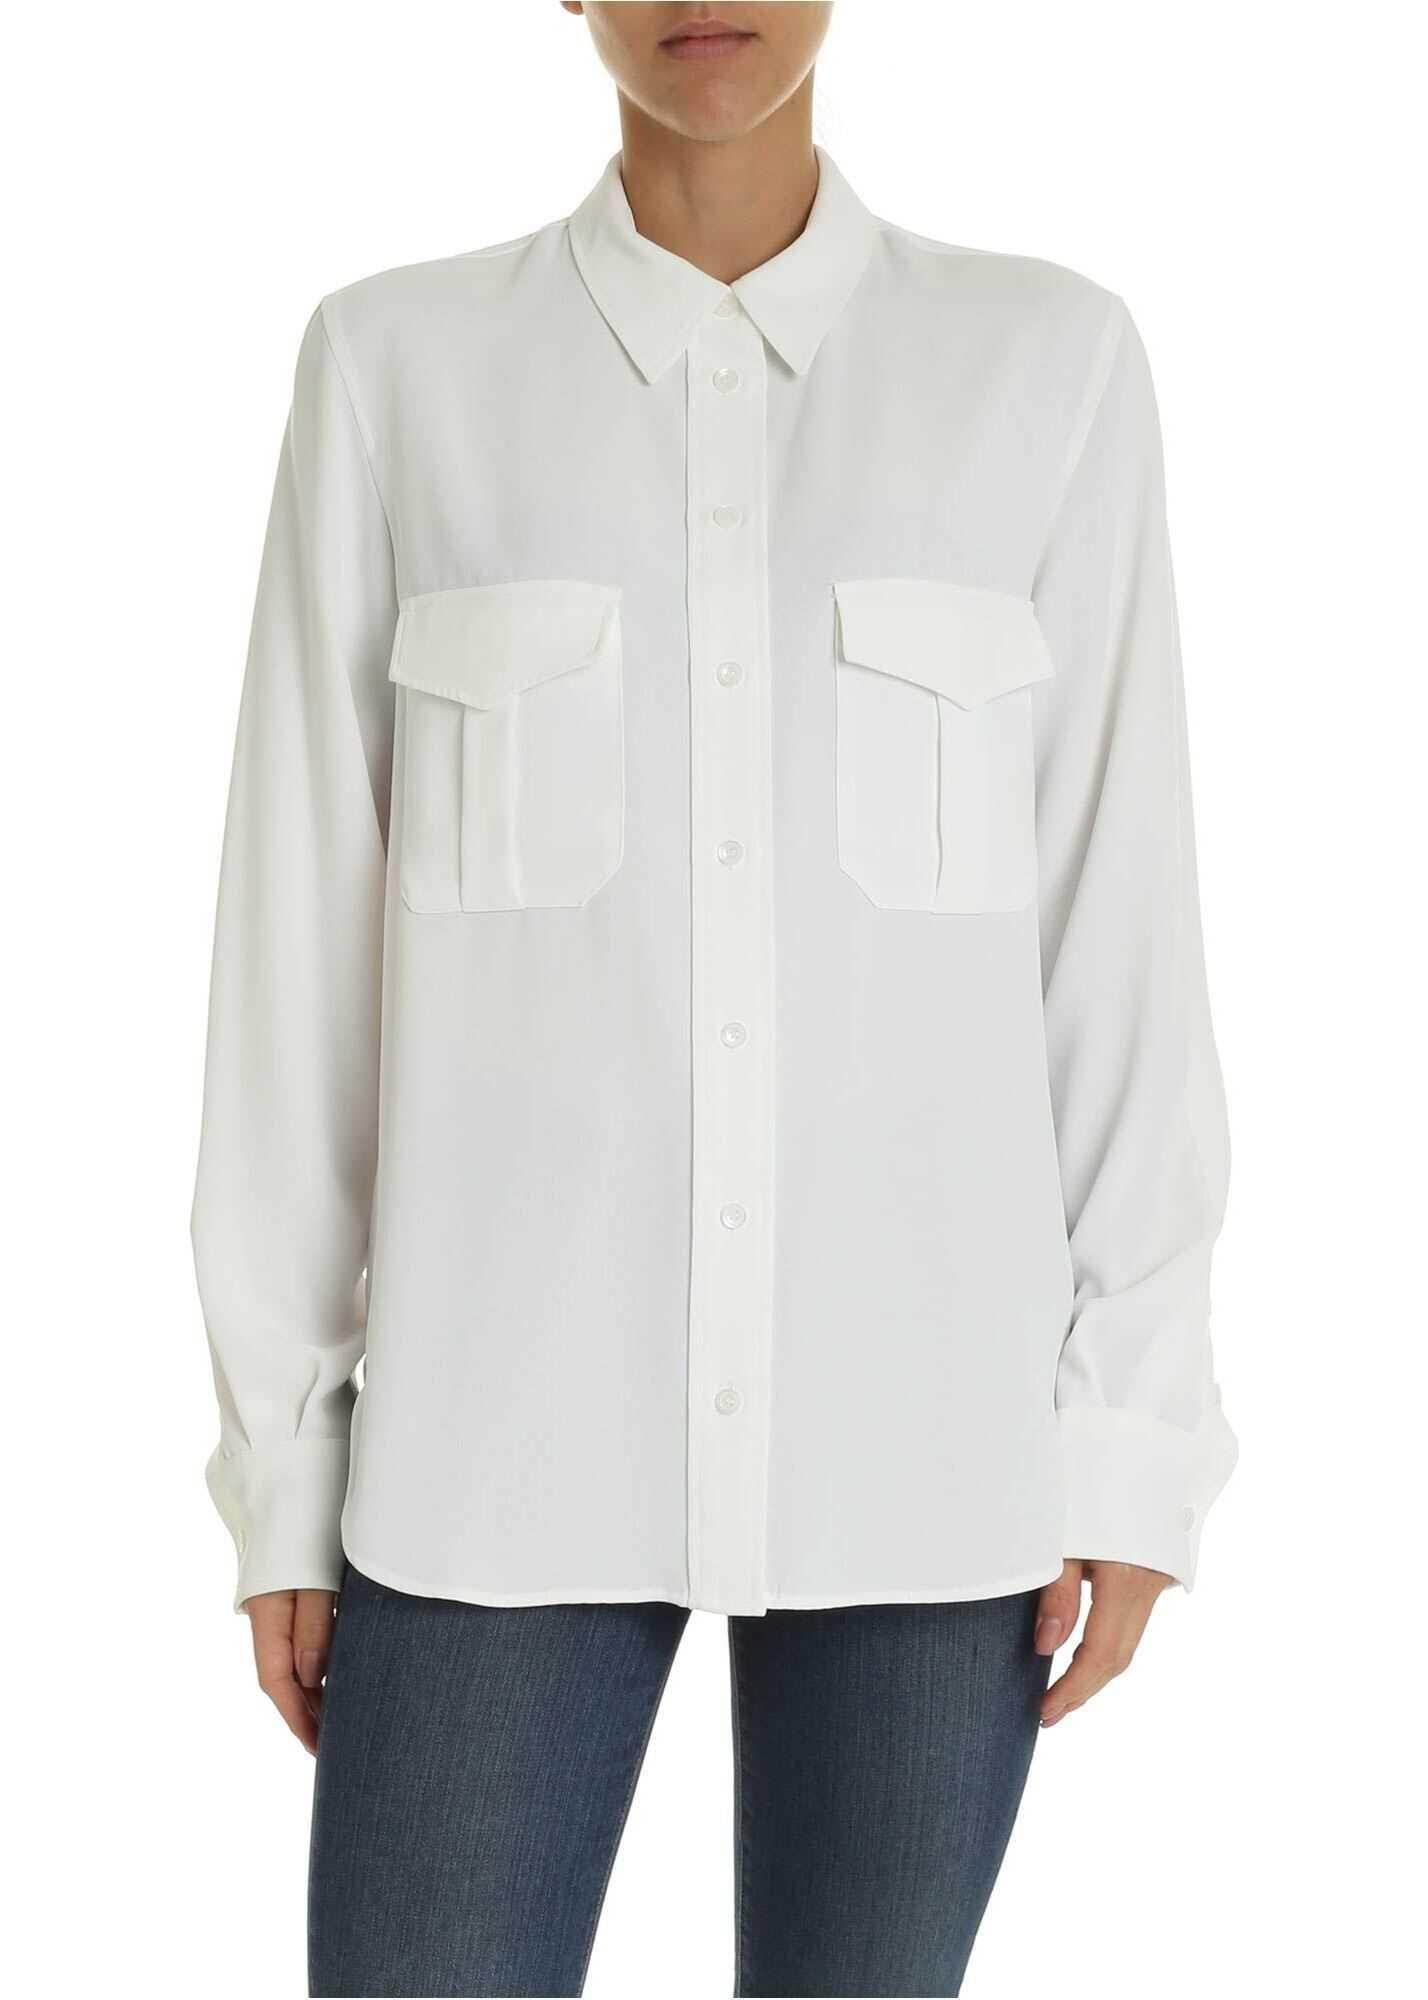 White Shirt With Pockets thumbnail